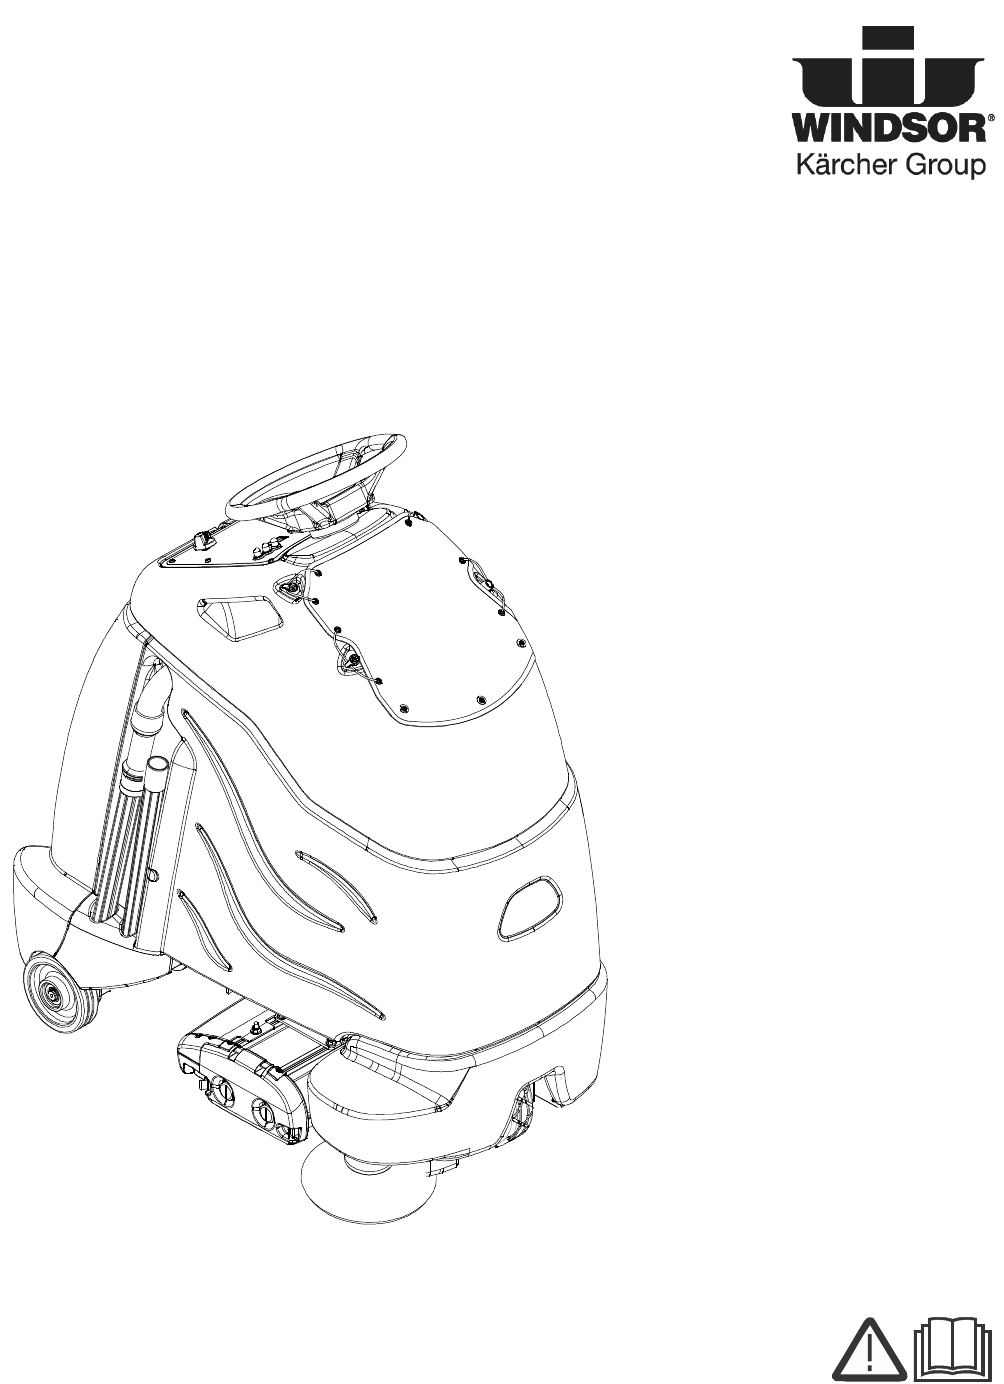 hight resolution of iring harn 240sx vacuum diagram browardcountymedicalassociation s13 sr20 vacuum diagram iring harn 240sx vacuum diagram